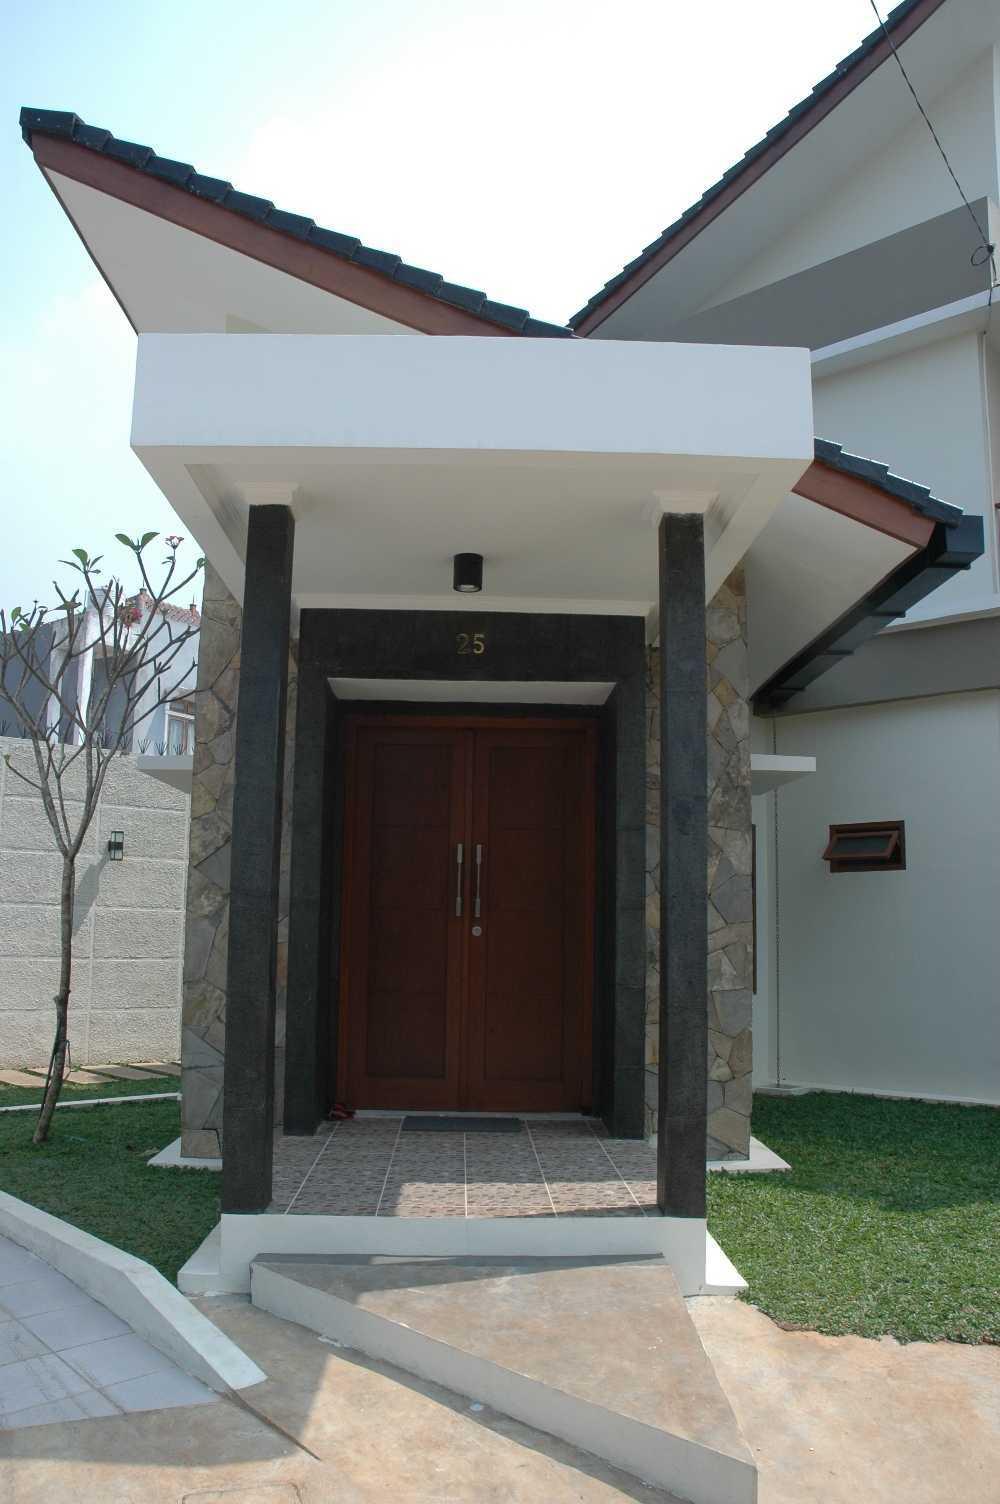 Triplus Homes Es House Rempoa, Ciputat Tim., Kota Tangerang Selatan, Banten, Indonesia Rempoa, Ciputat Tim., Kota Tangerang Selatan, Banten, Indonesia Triplus-Homes-Es-House   56609